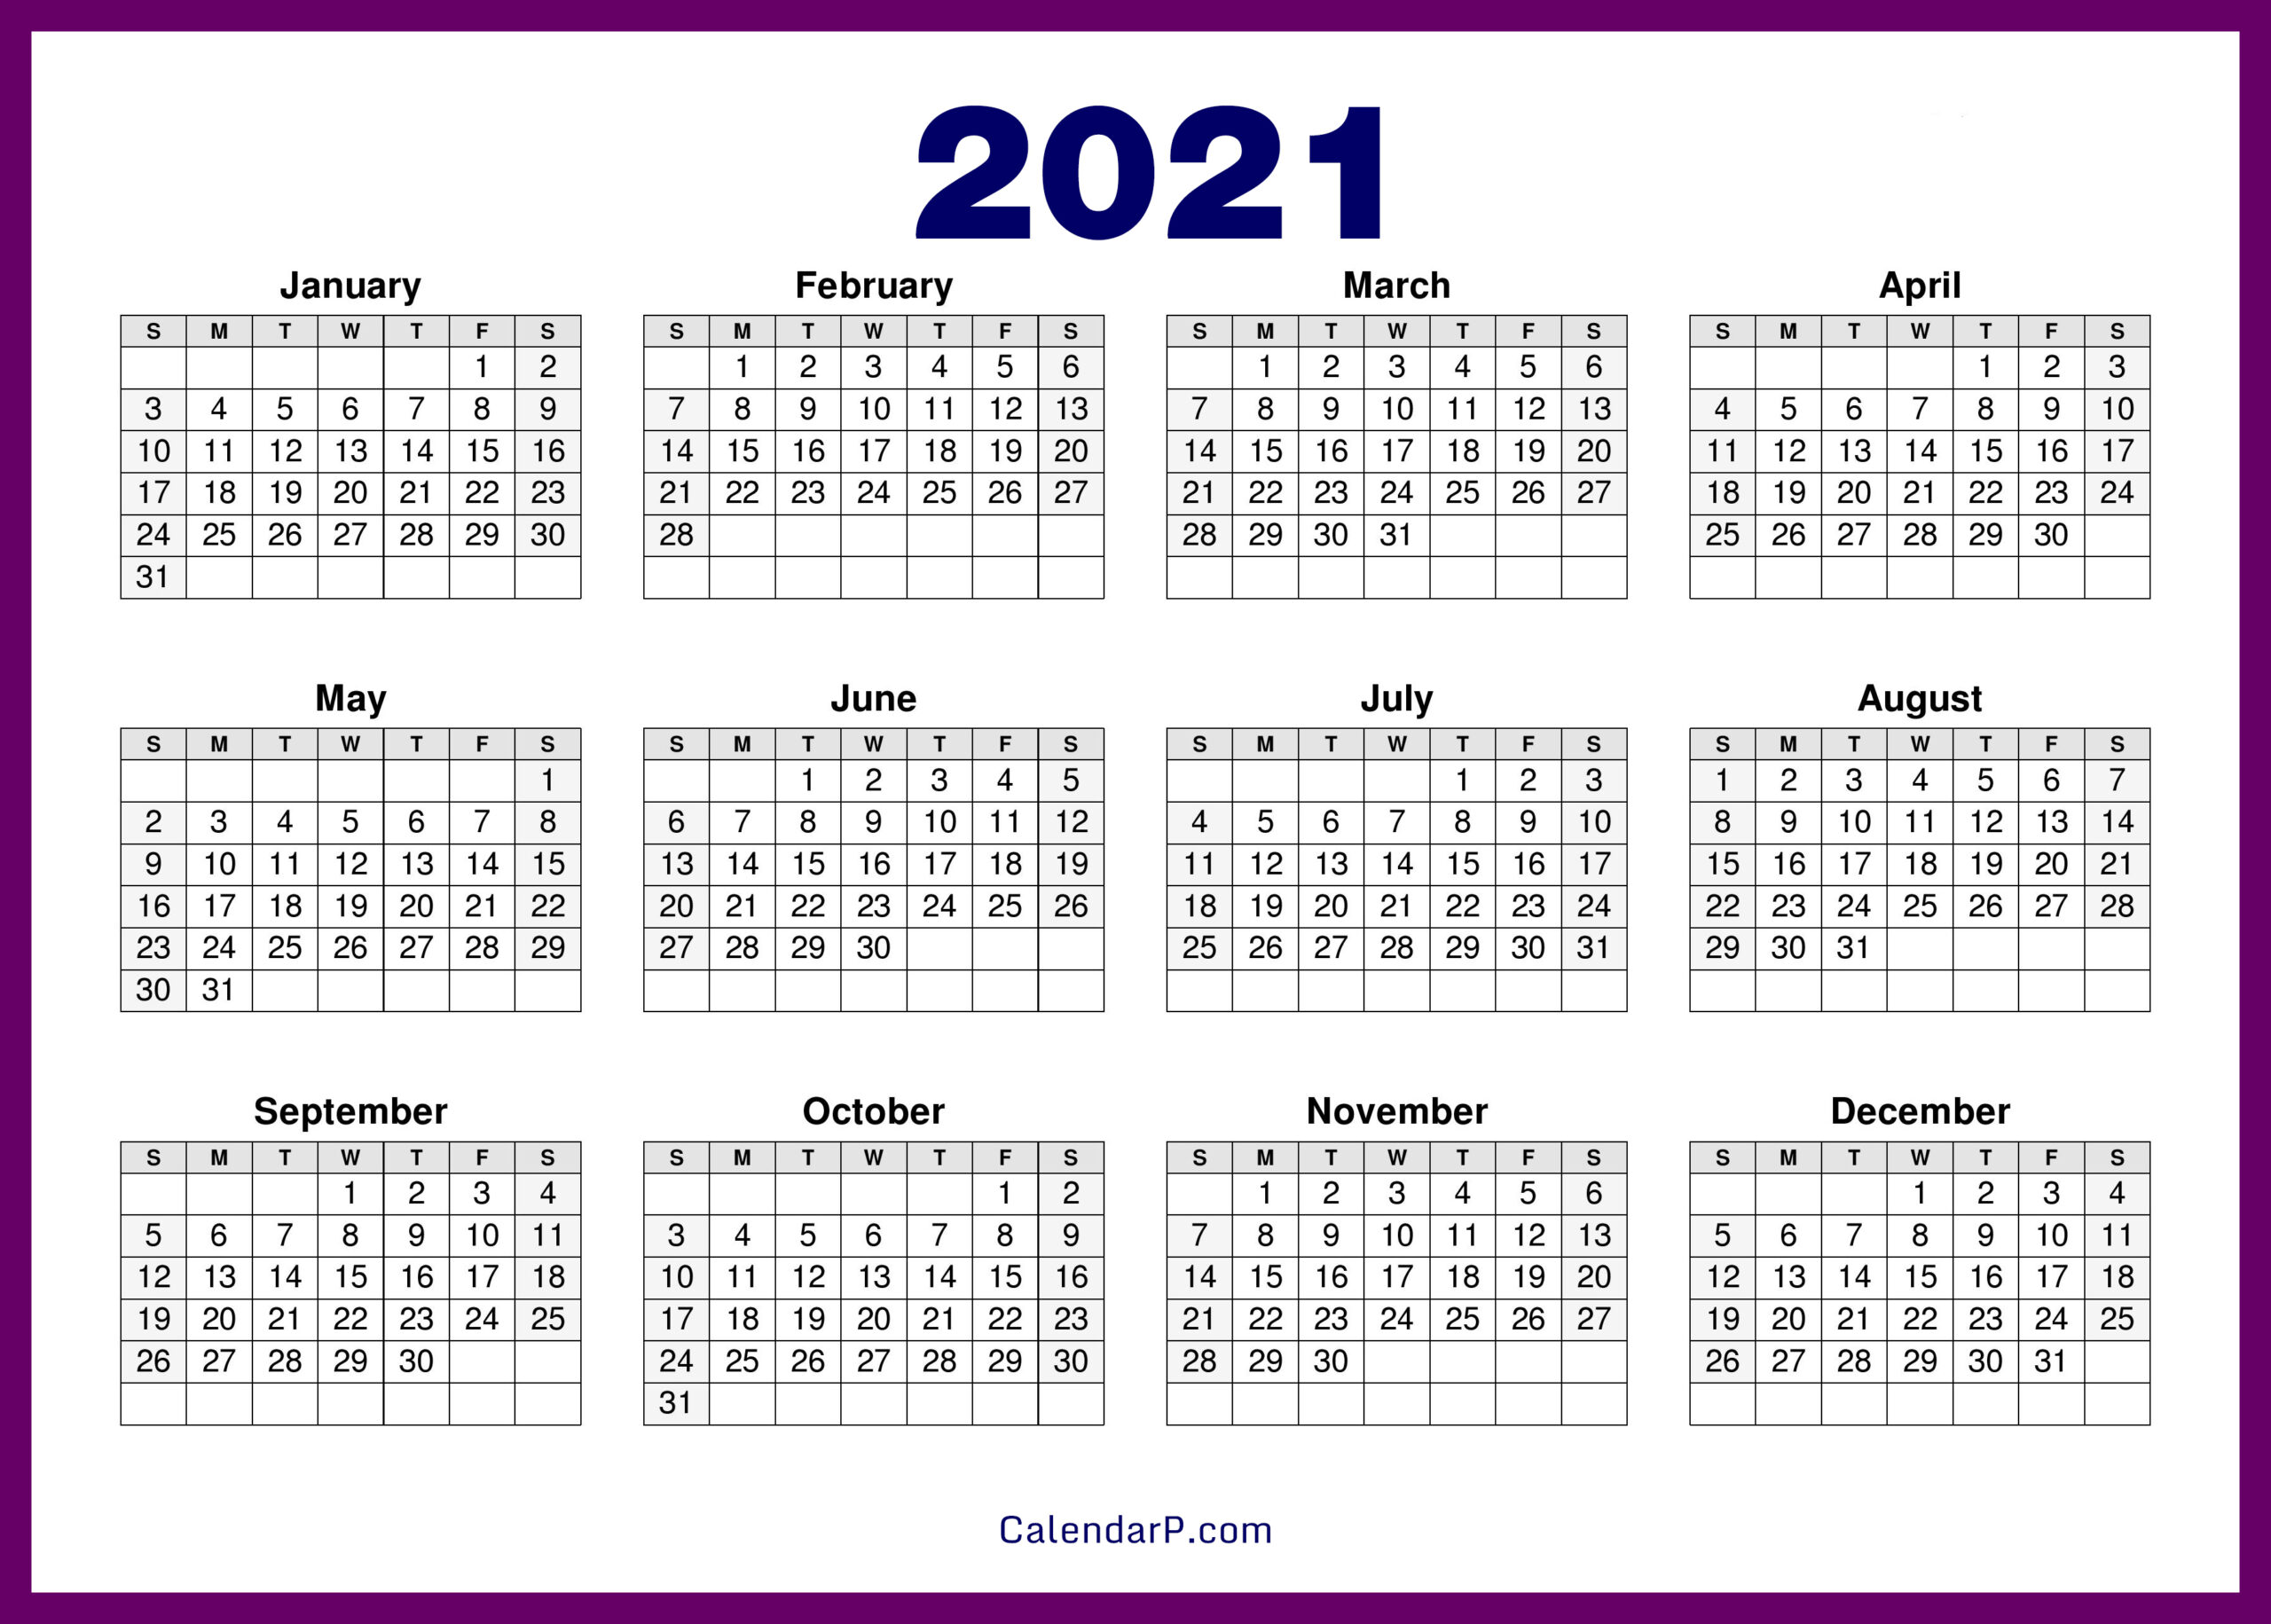 2021 Calendar Printable Free Hd – Purple – Calendarp